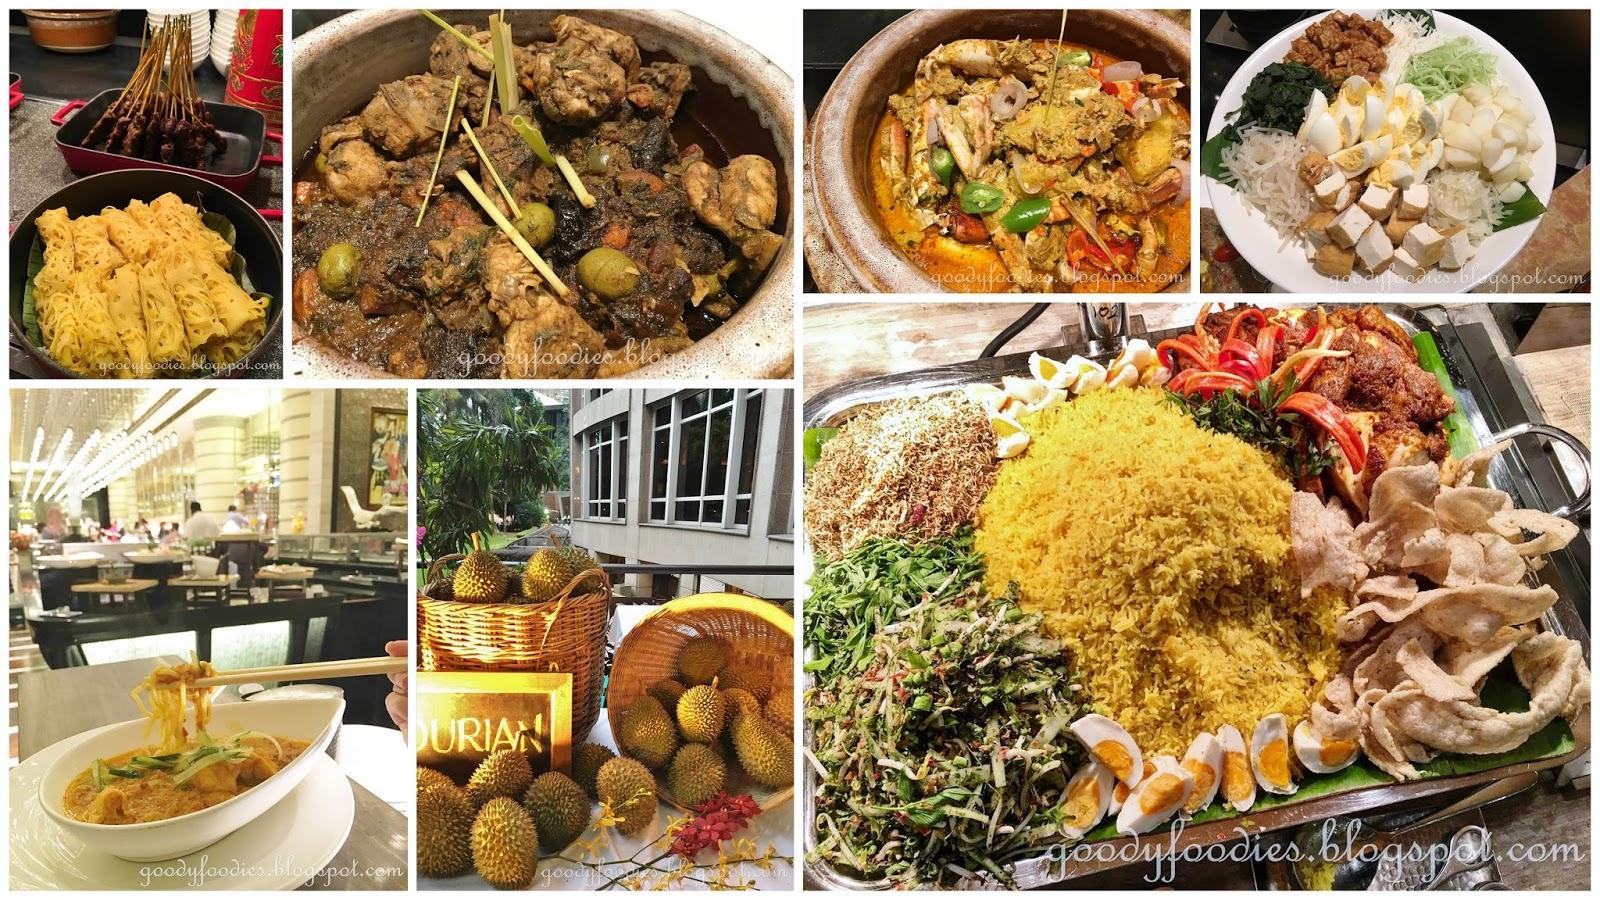 Goodyfoodies ramadan buffet 2017 mandarin oriental kl featuring for appetisers delight in a unique assortment of kerabu such as pasembor pulau pinang jaganan rojak betik terengganu karedok lawar bal forumfinder Choice Image